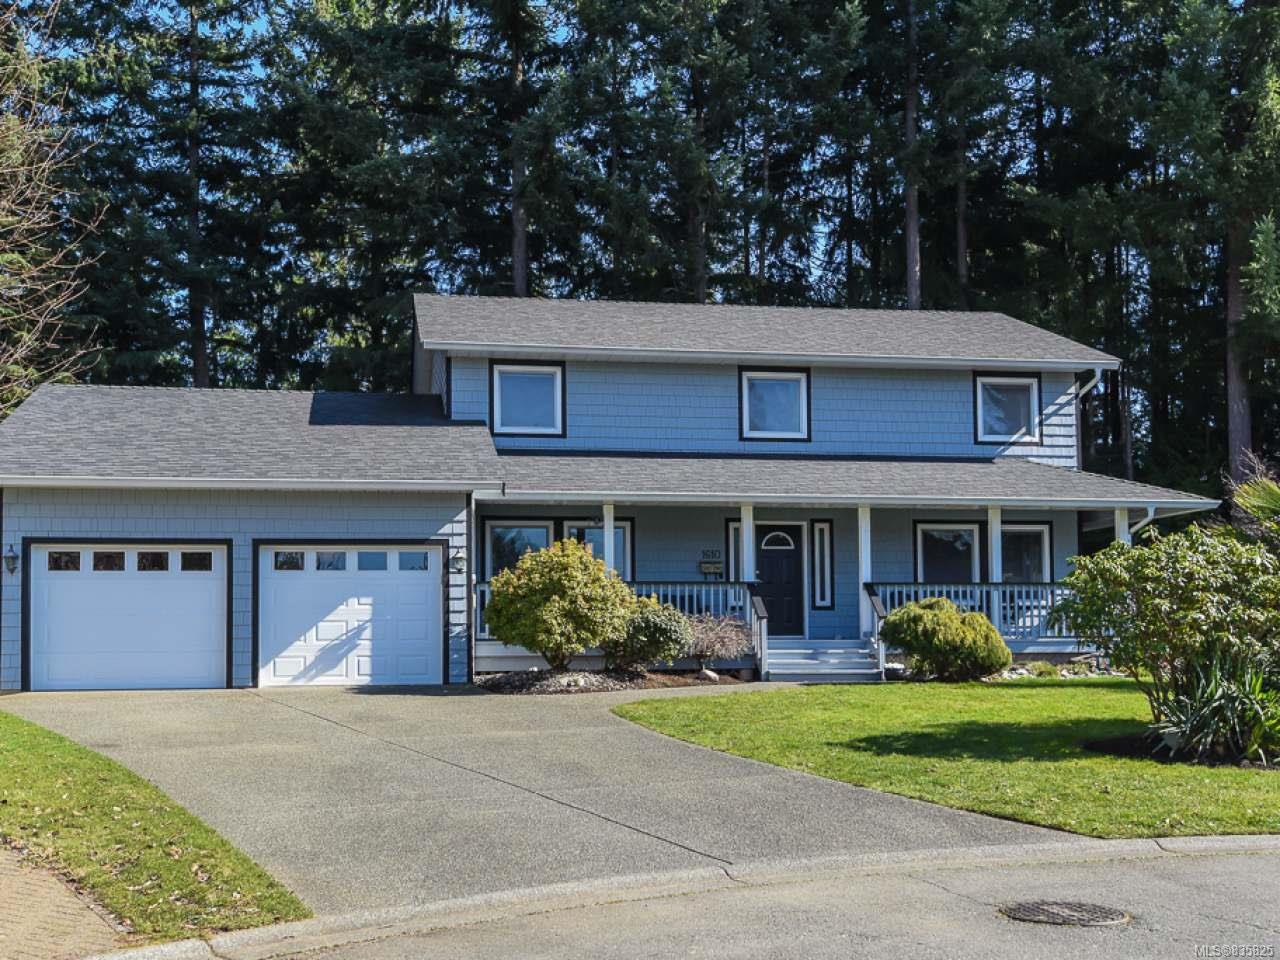 Main Photo: 1610 Kingsley Crt in COMOX: CV Comox (Town of) House for sale (Comox Valley)  : MLS®# 835825